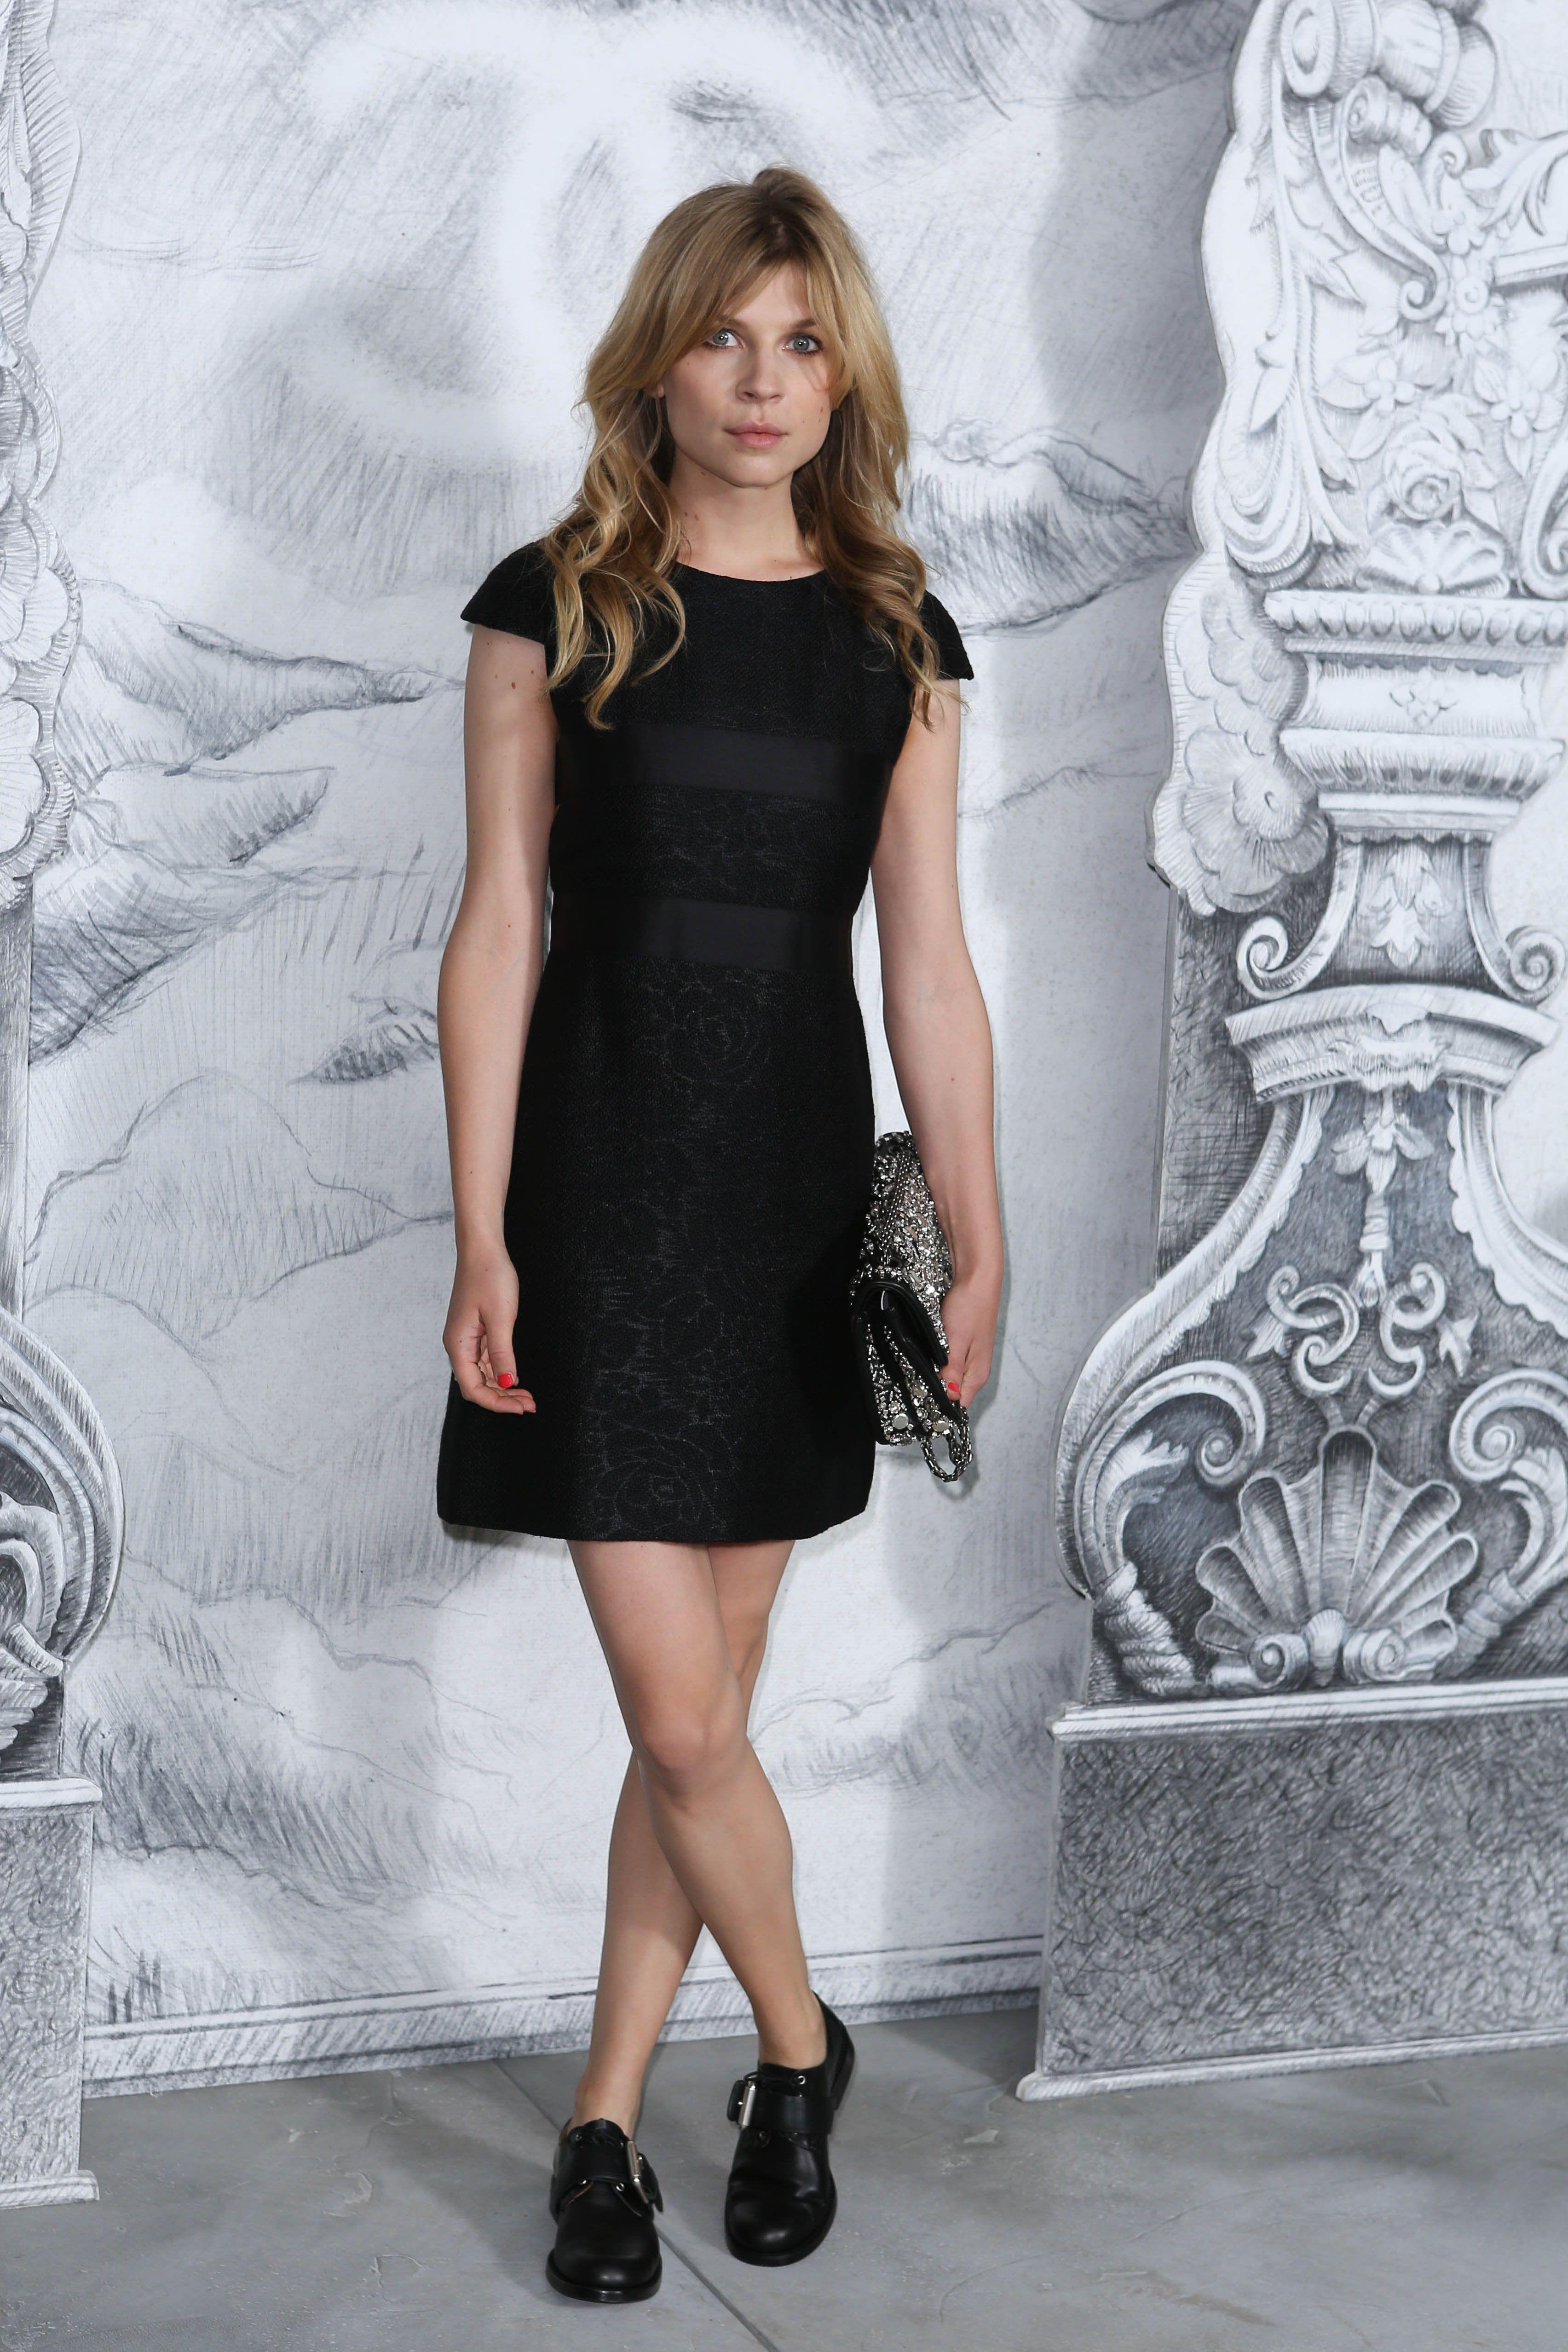 Les people chez Chanel ! | Glamour